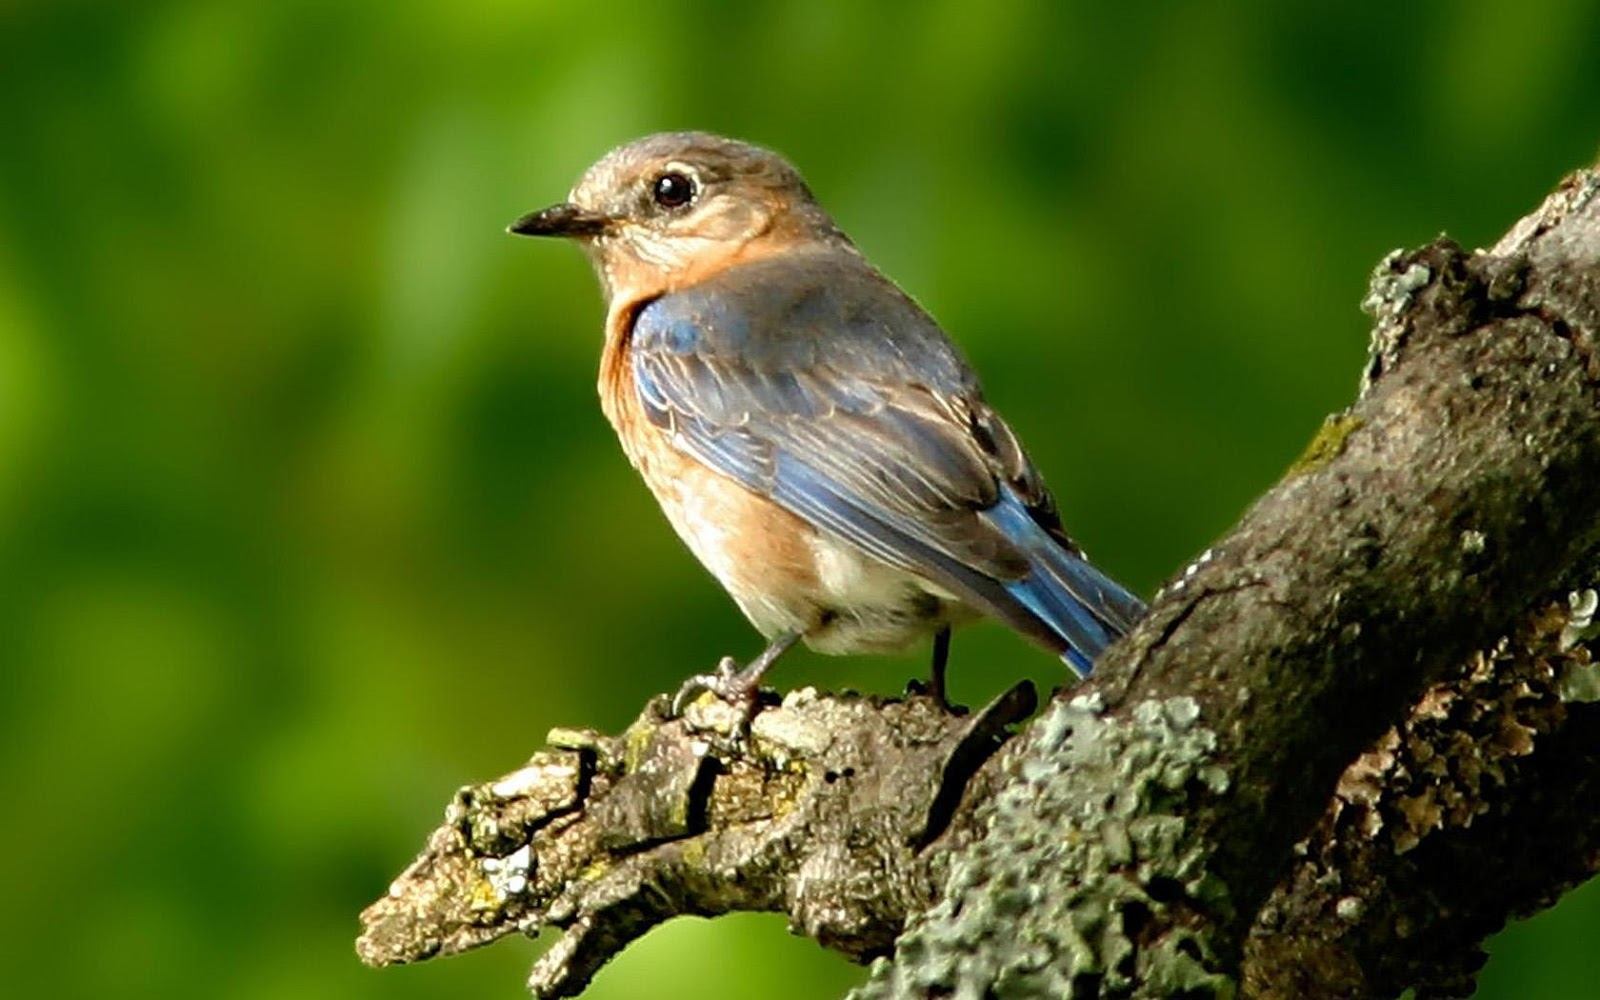 Birds Wallpapers animals pictures